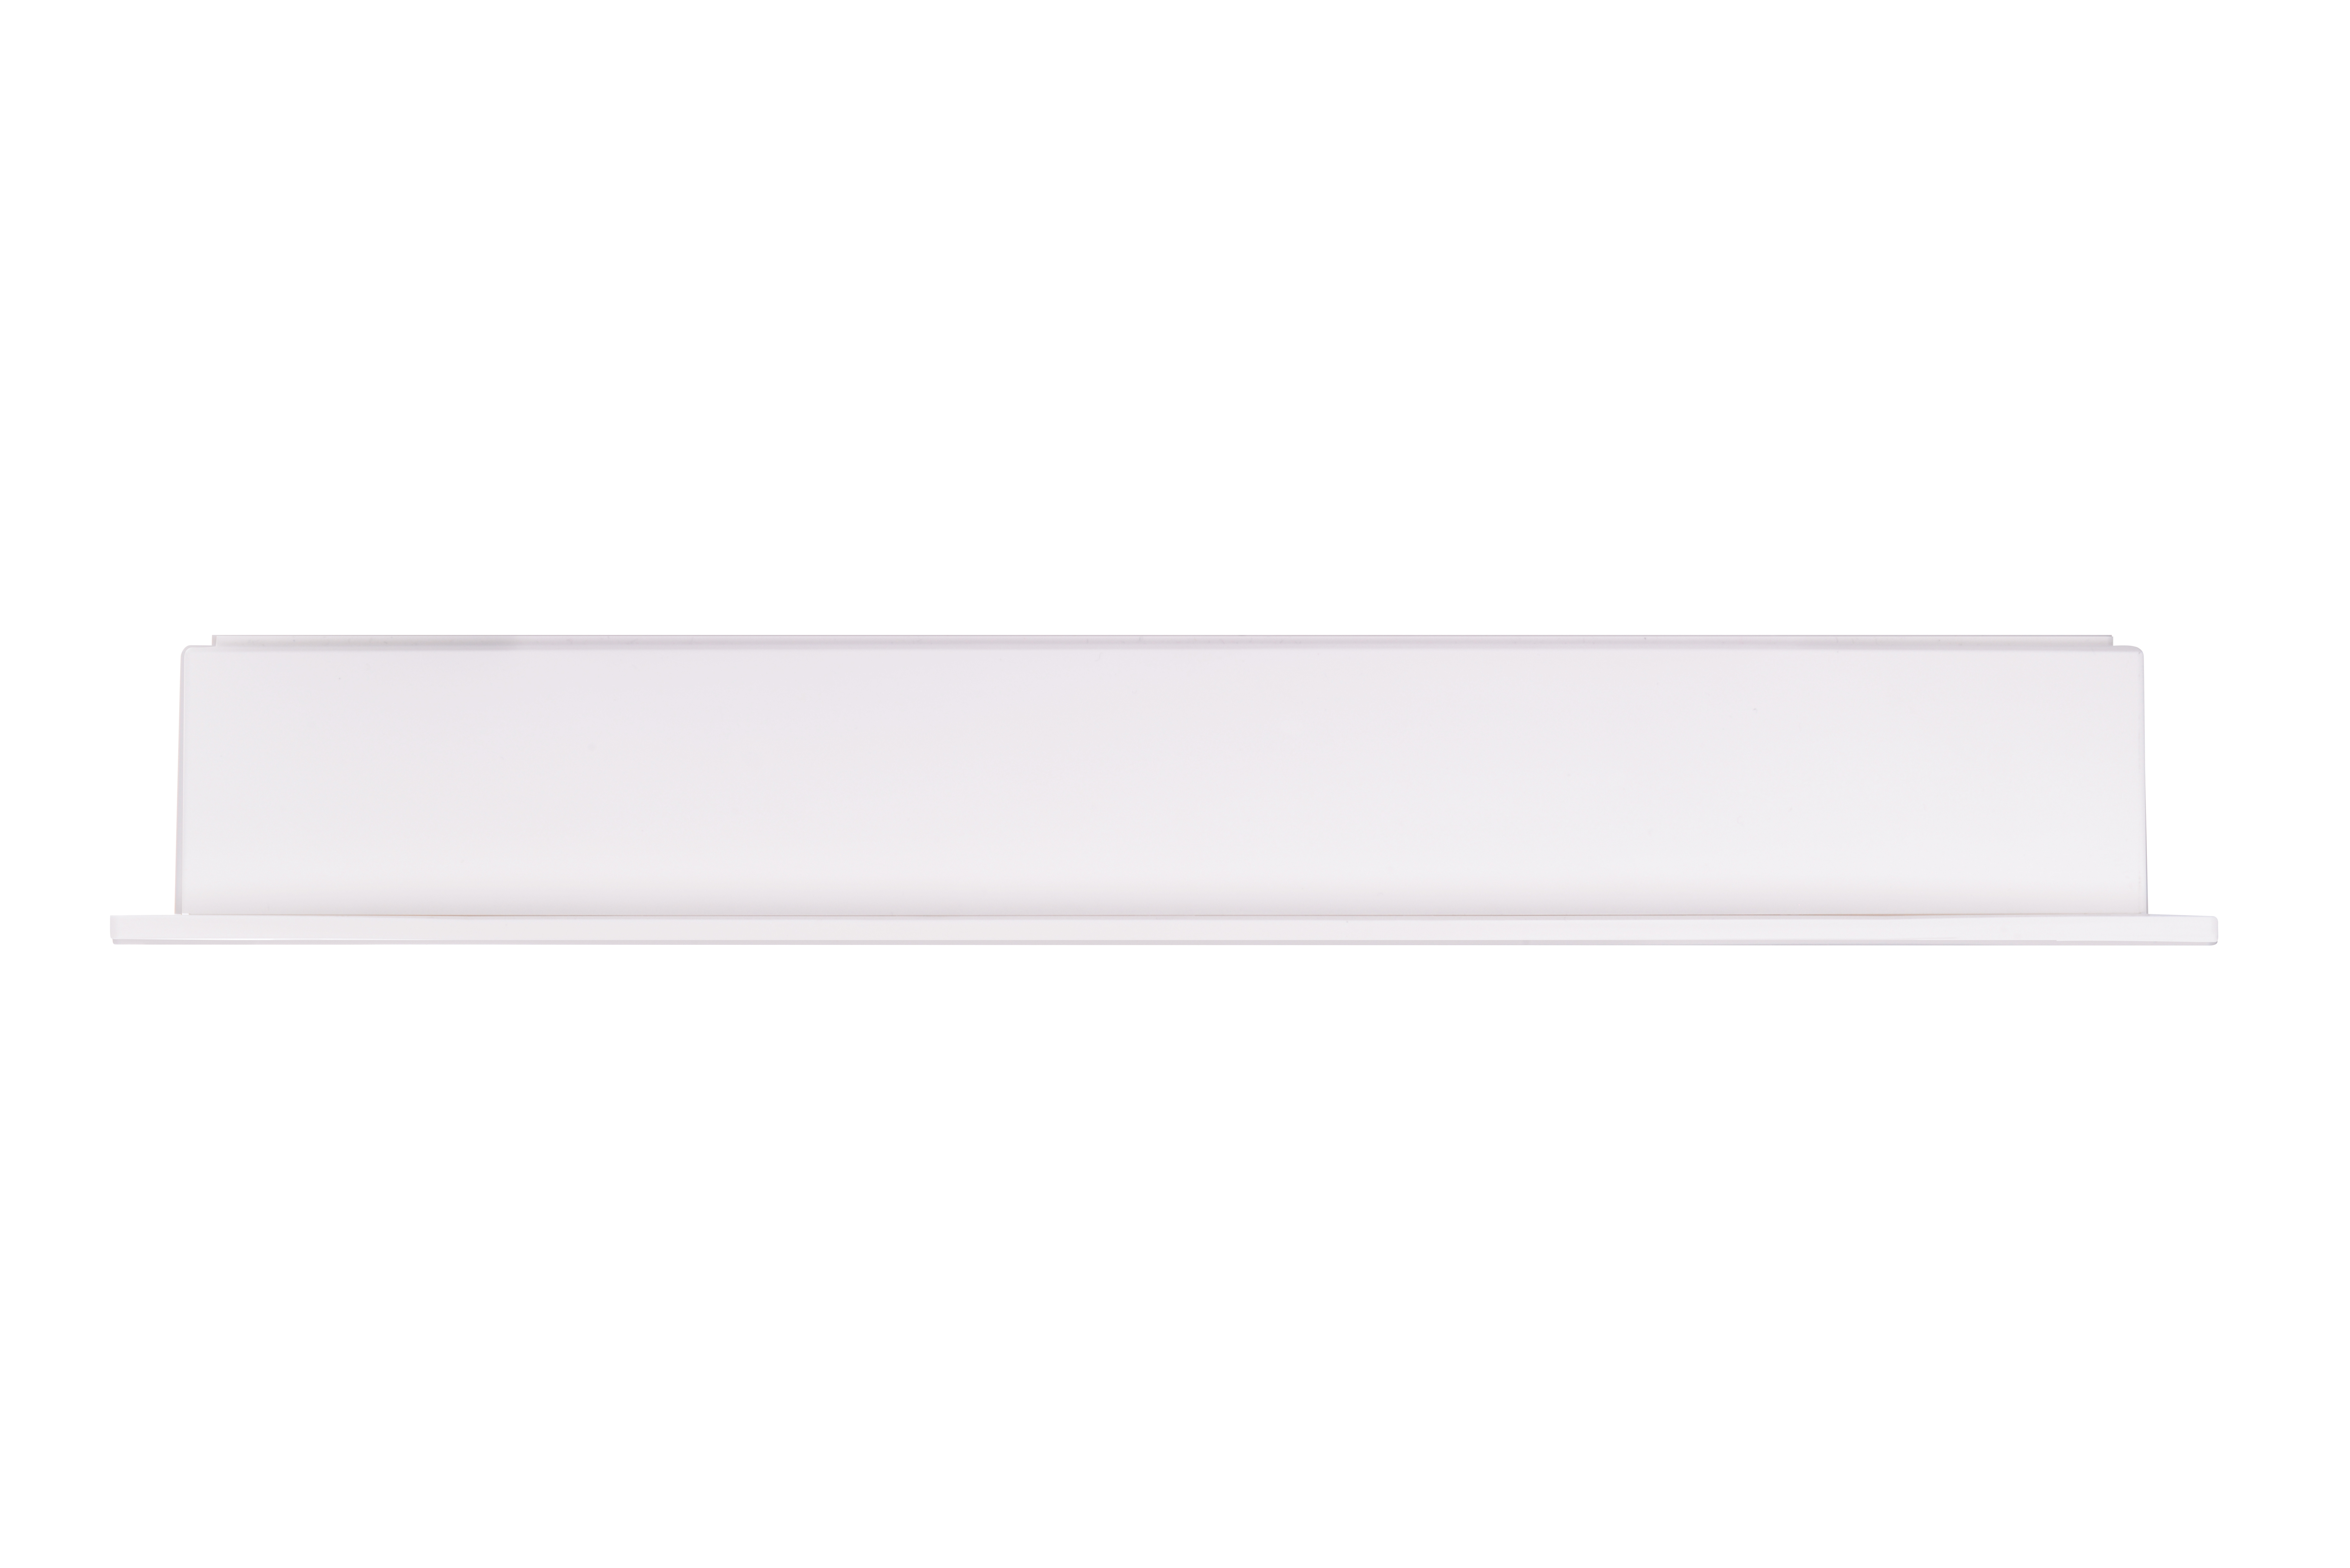 Lampa emergenta led Intelight 94764   3h mentinut test automat 5